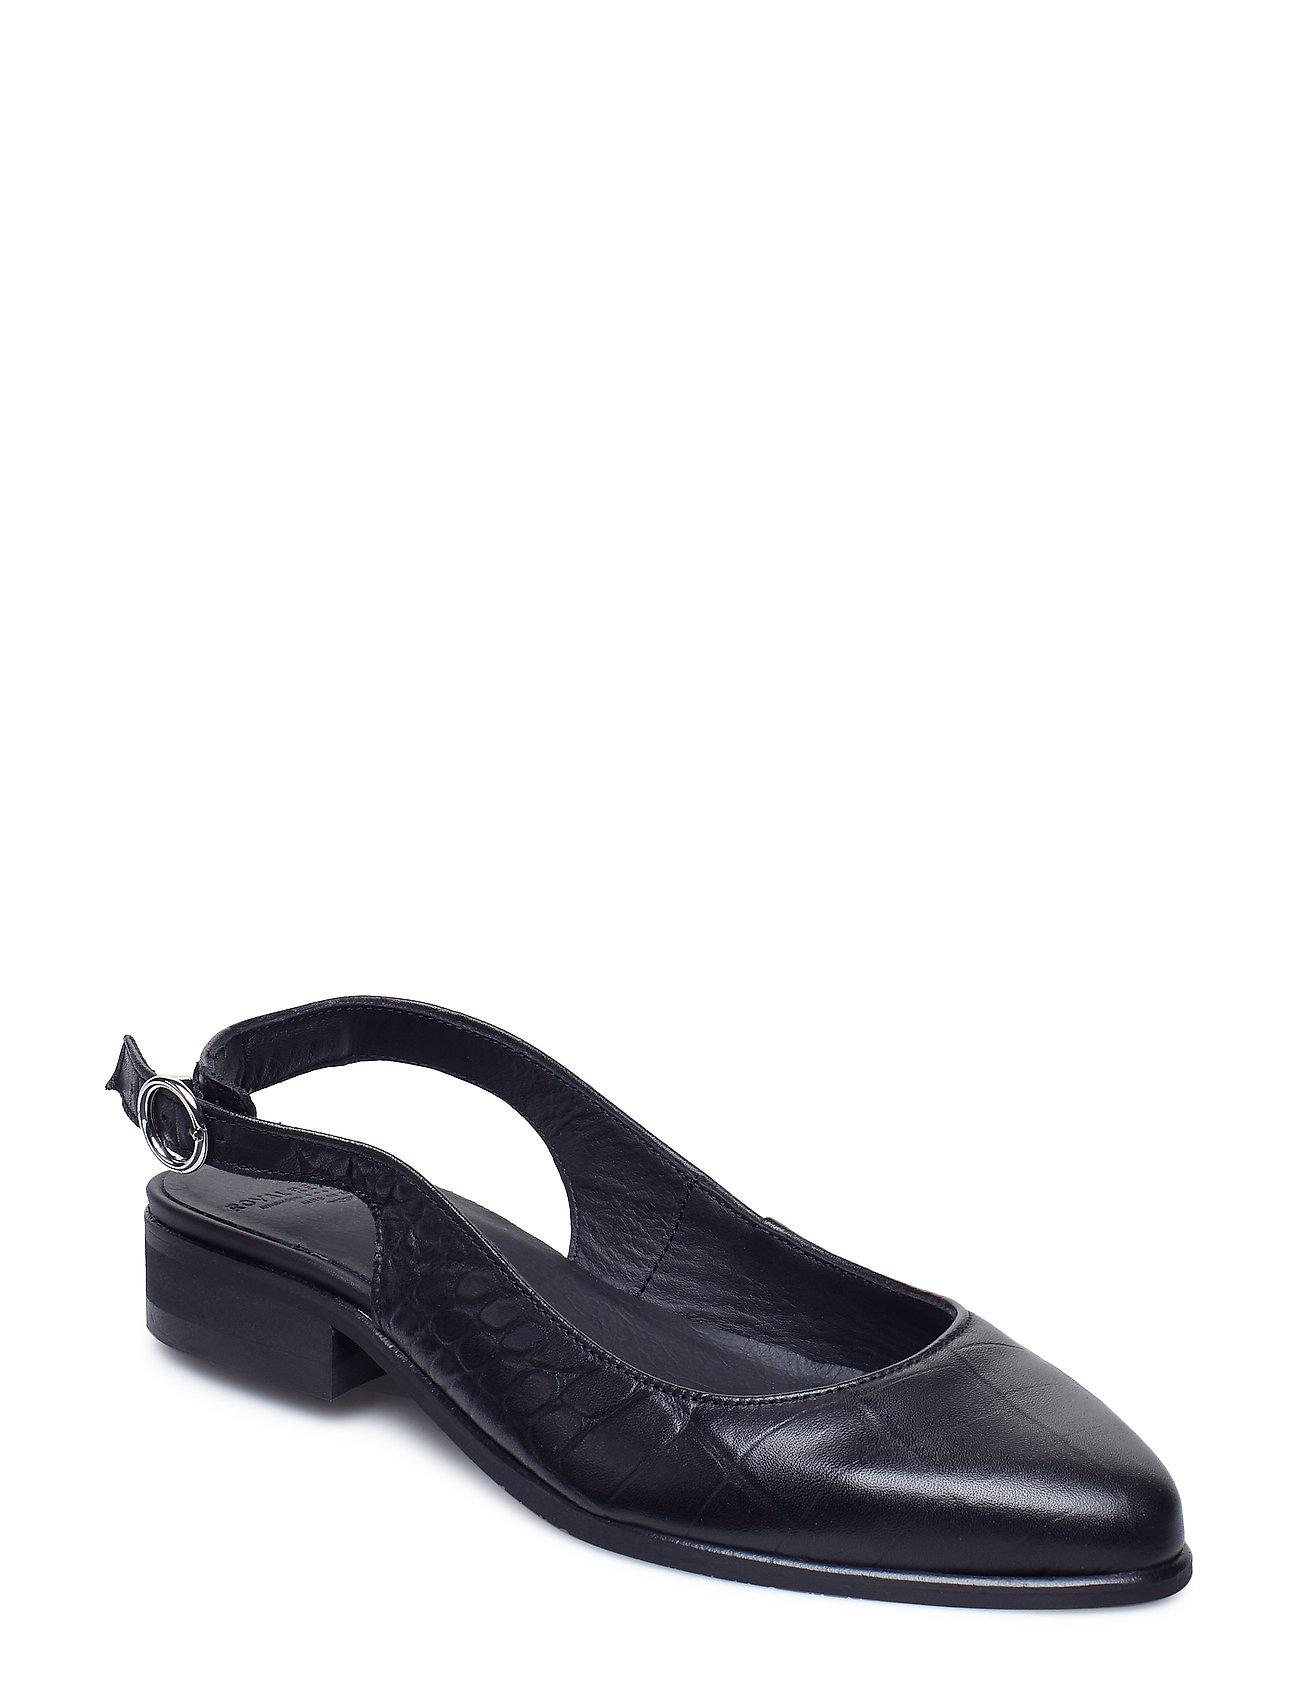 Slingback Ballerina Damer Flade Sko Ballerina | Flade